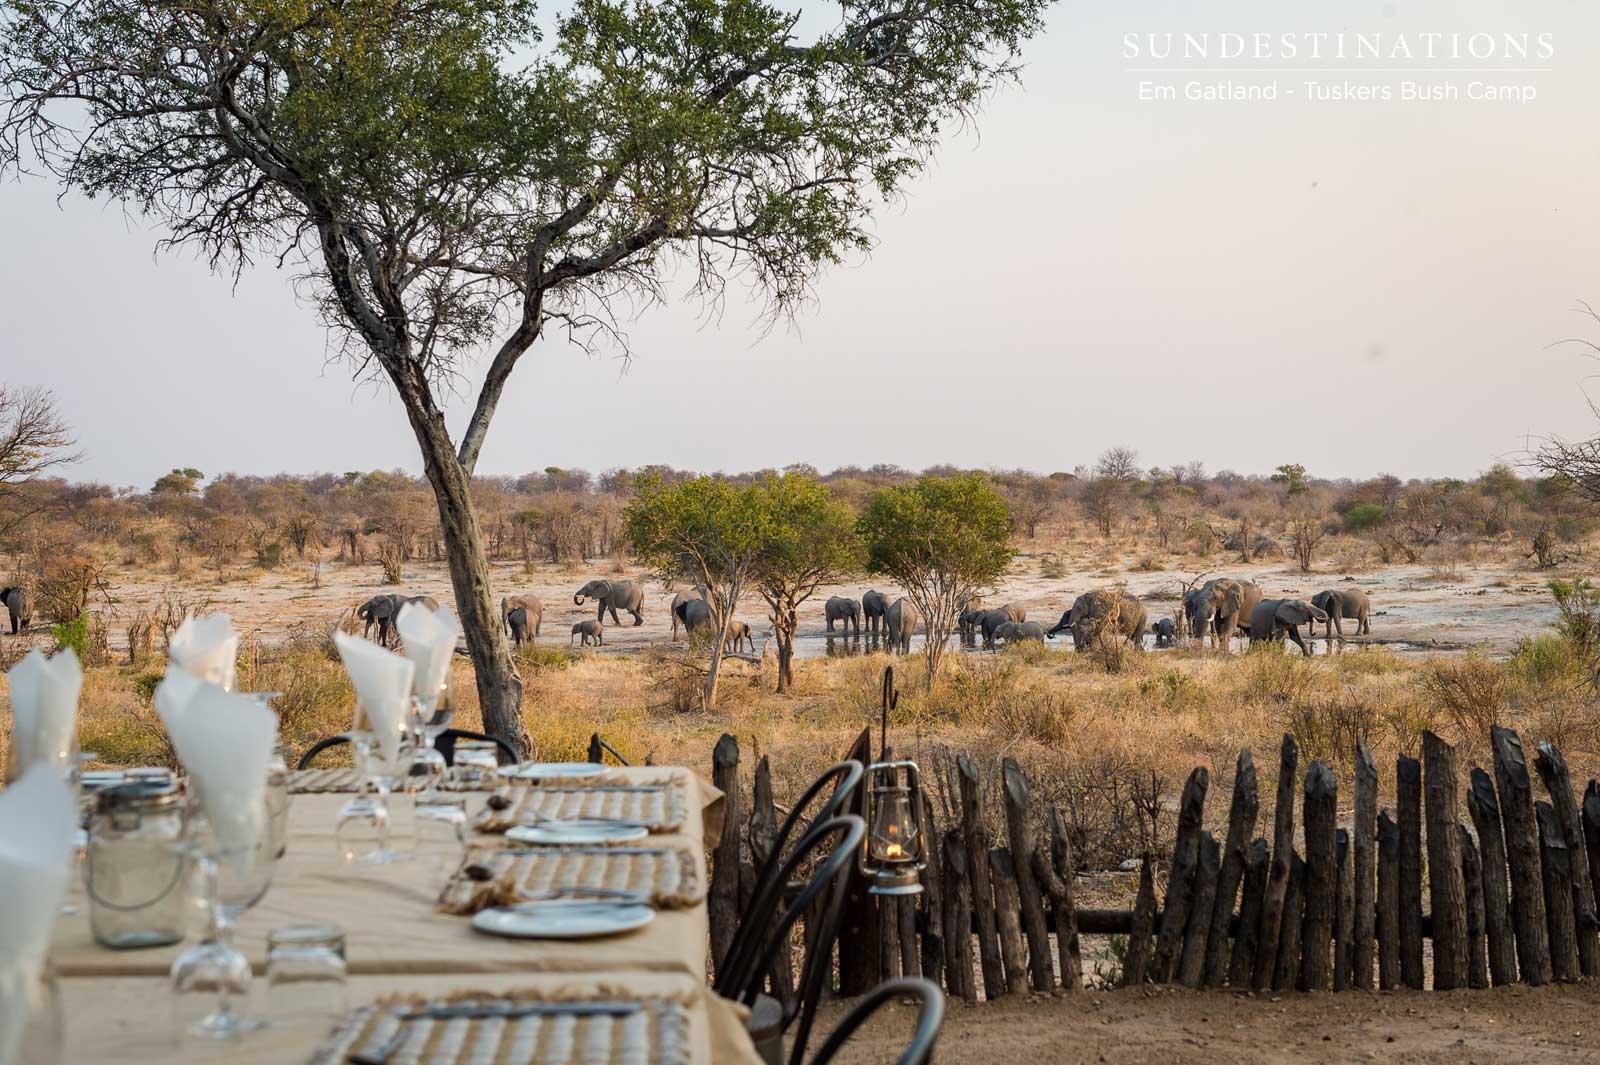 Elephants at Tuskers Bush Camp